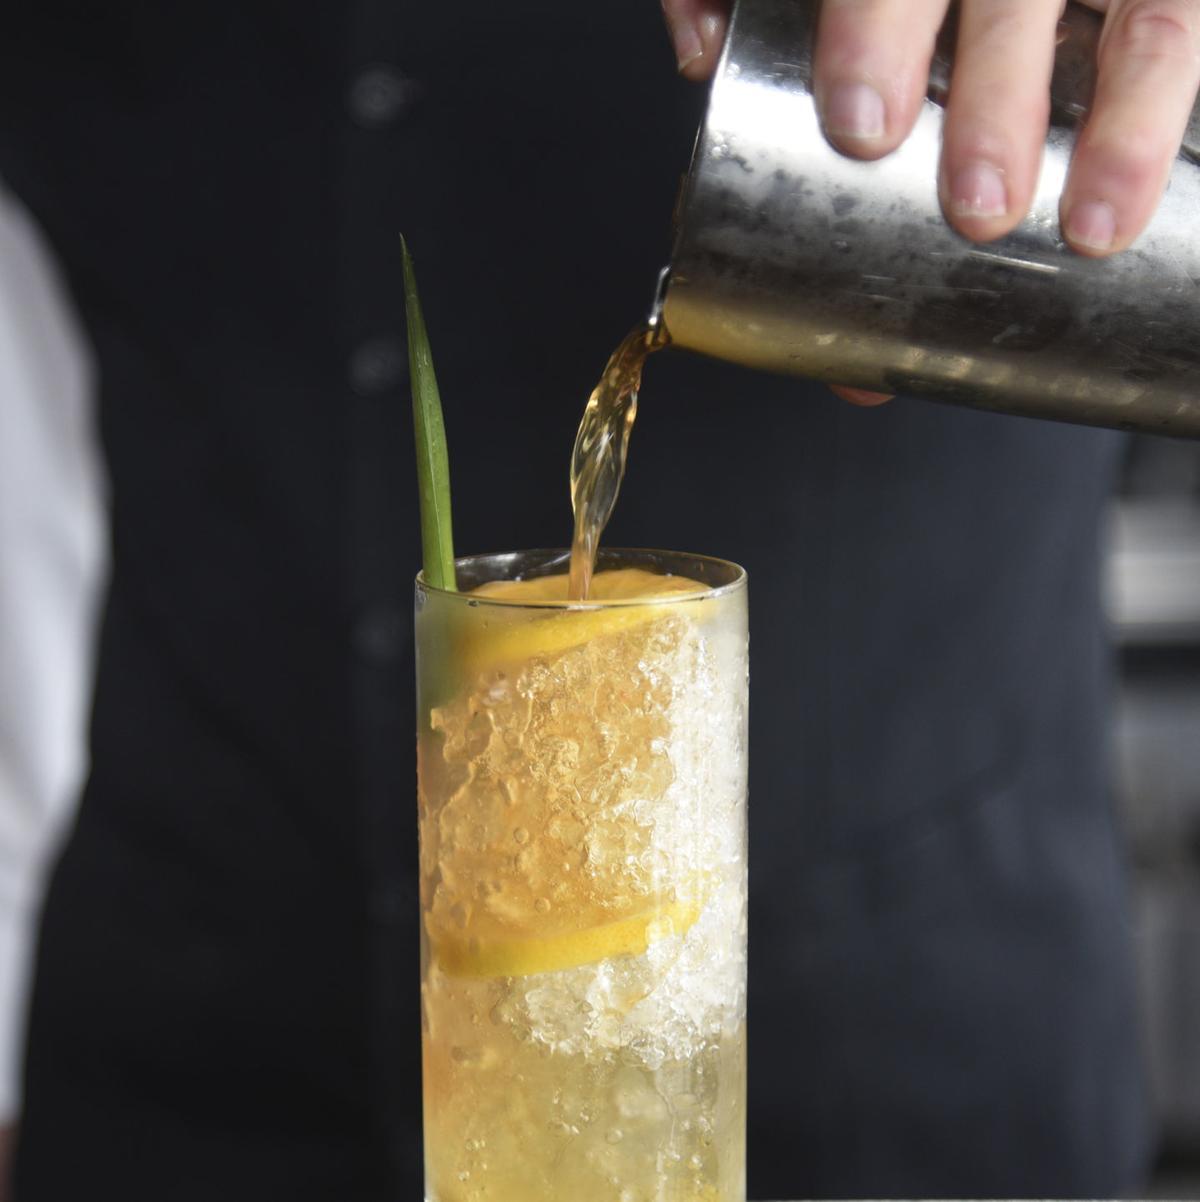 020520_drinks 6